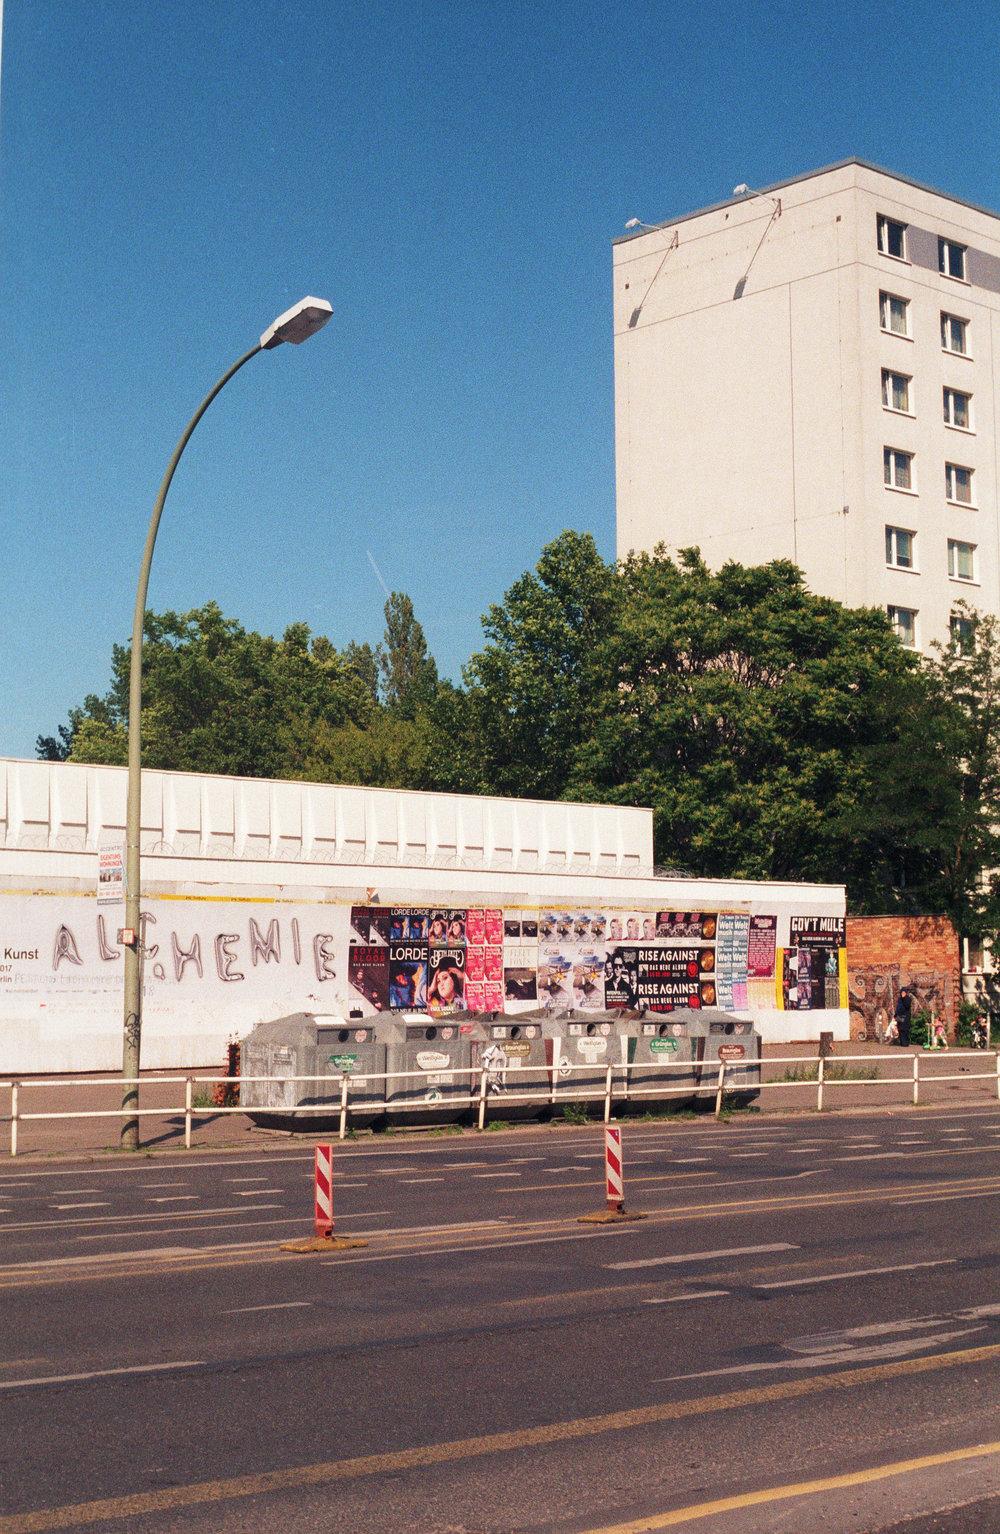 Berlin_72dpi-6.jpg